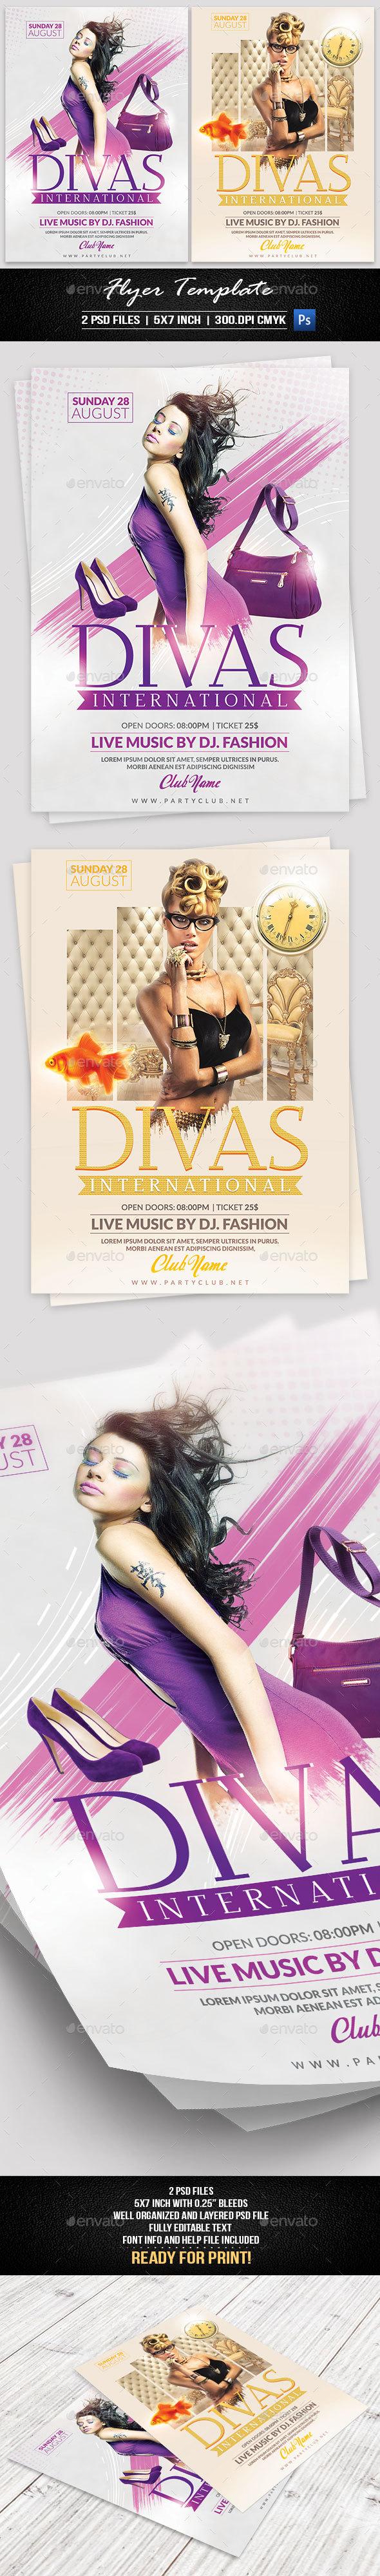 Divas International Flyer Template - Flyers Print Templates